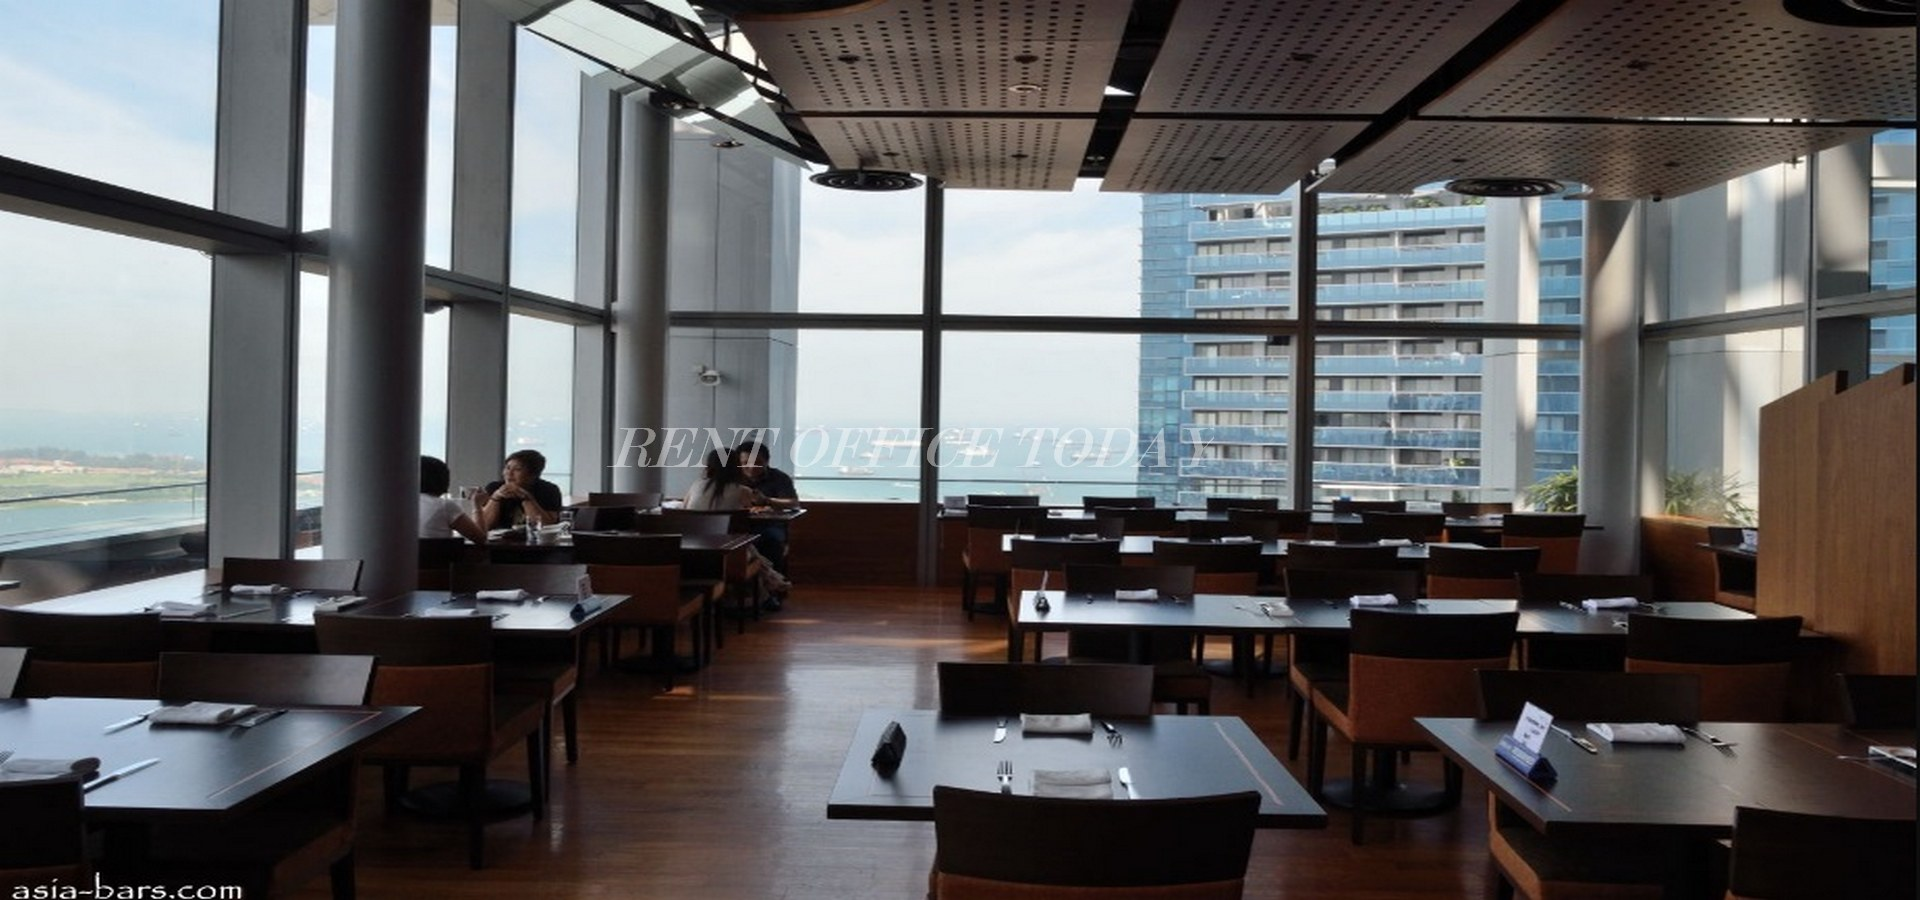 бизнес центр marina bay financial centre-9